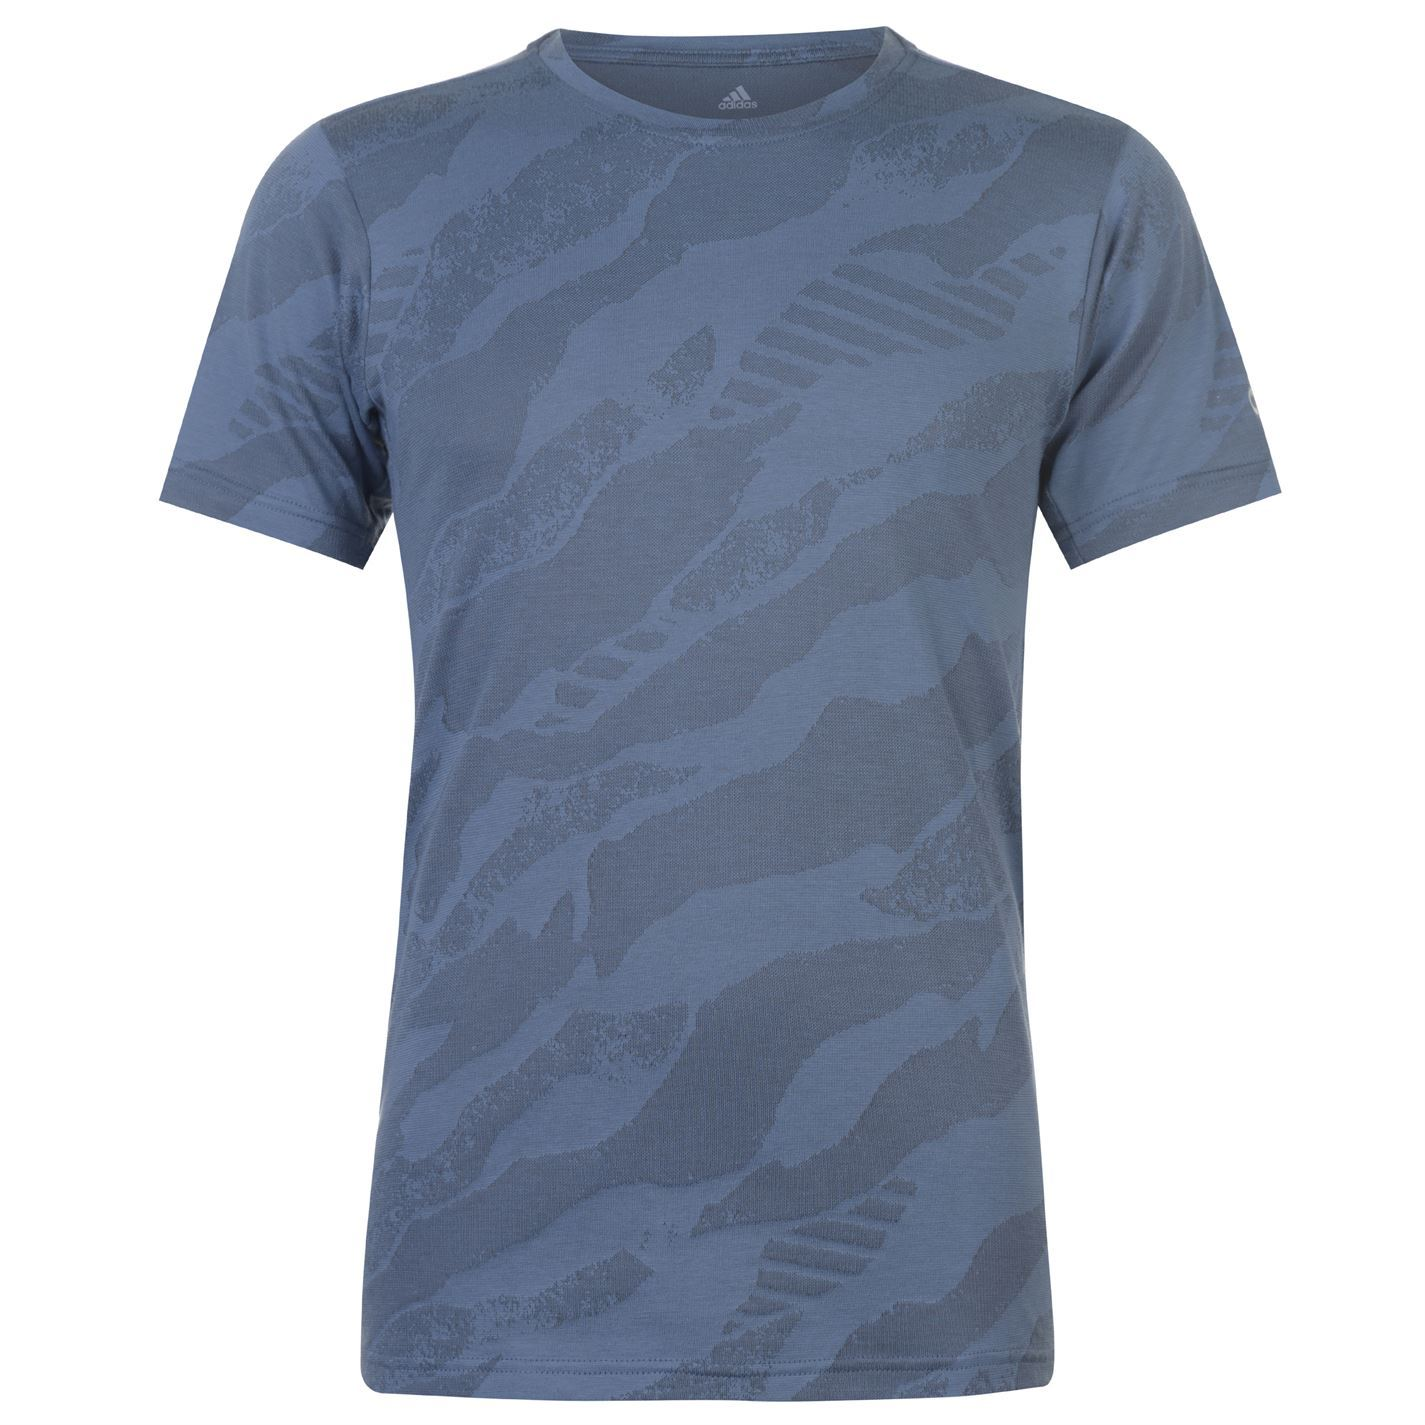 Adidas FreeLift Training Top Mens Mens Mens Fitness Gym Workout T-Shirt Tee d57402